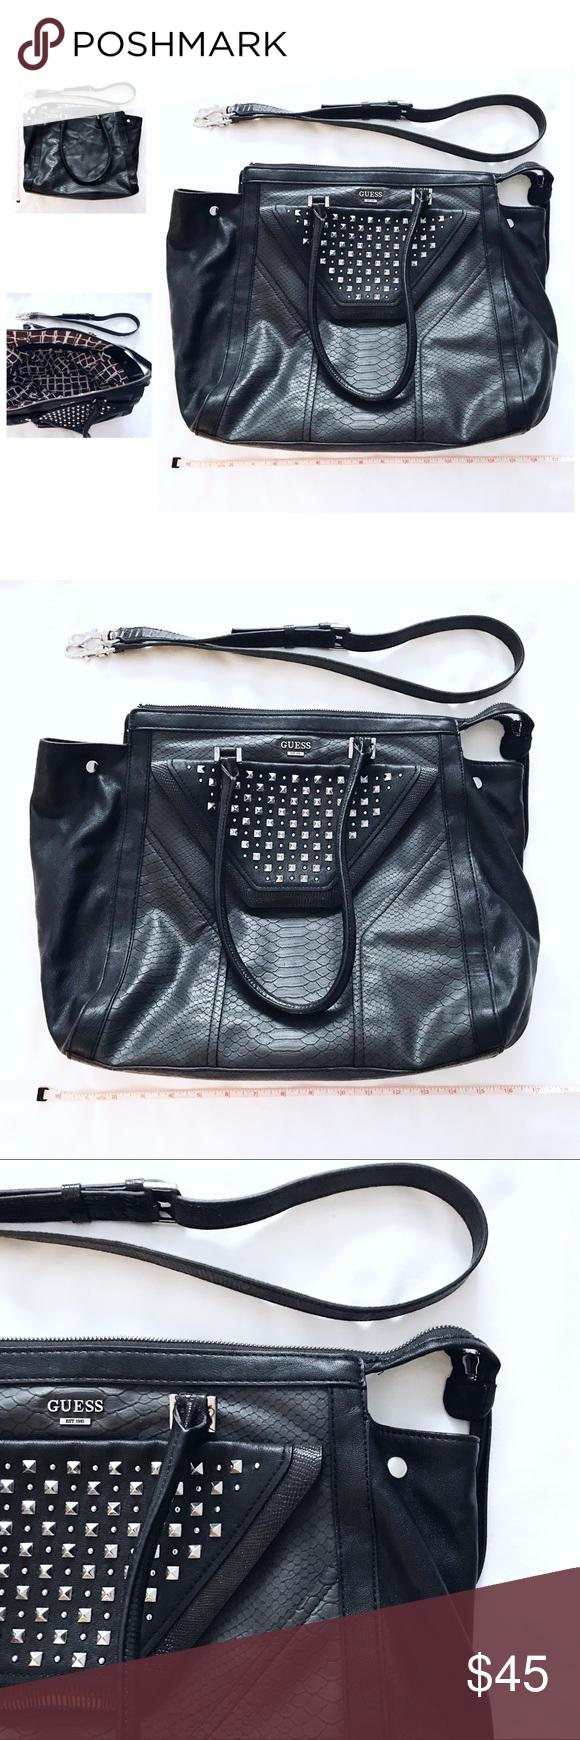 G U E S S Black Studded Satchel Crossbody Bag • Guess • black   dark  charcoal • silver studded detail • satchel   shoulder   Crossbody bag •  removable long ... f9d5152e4011d